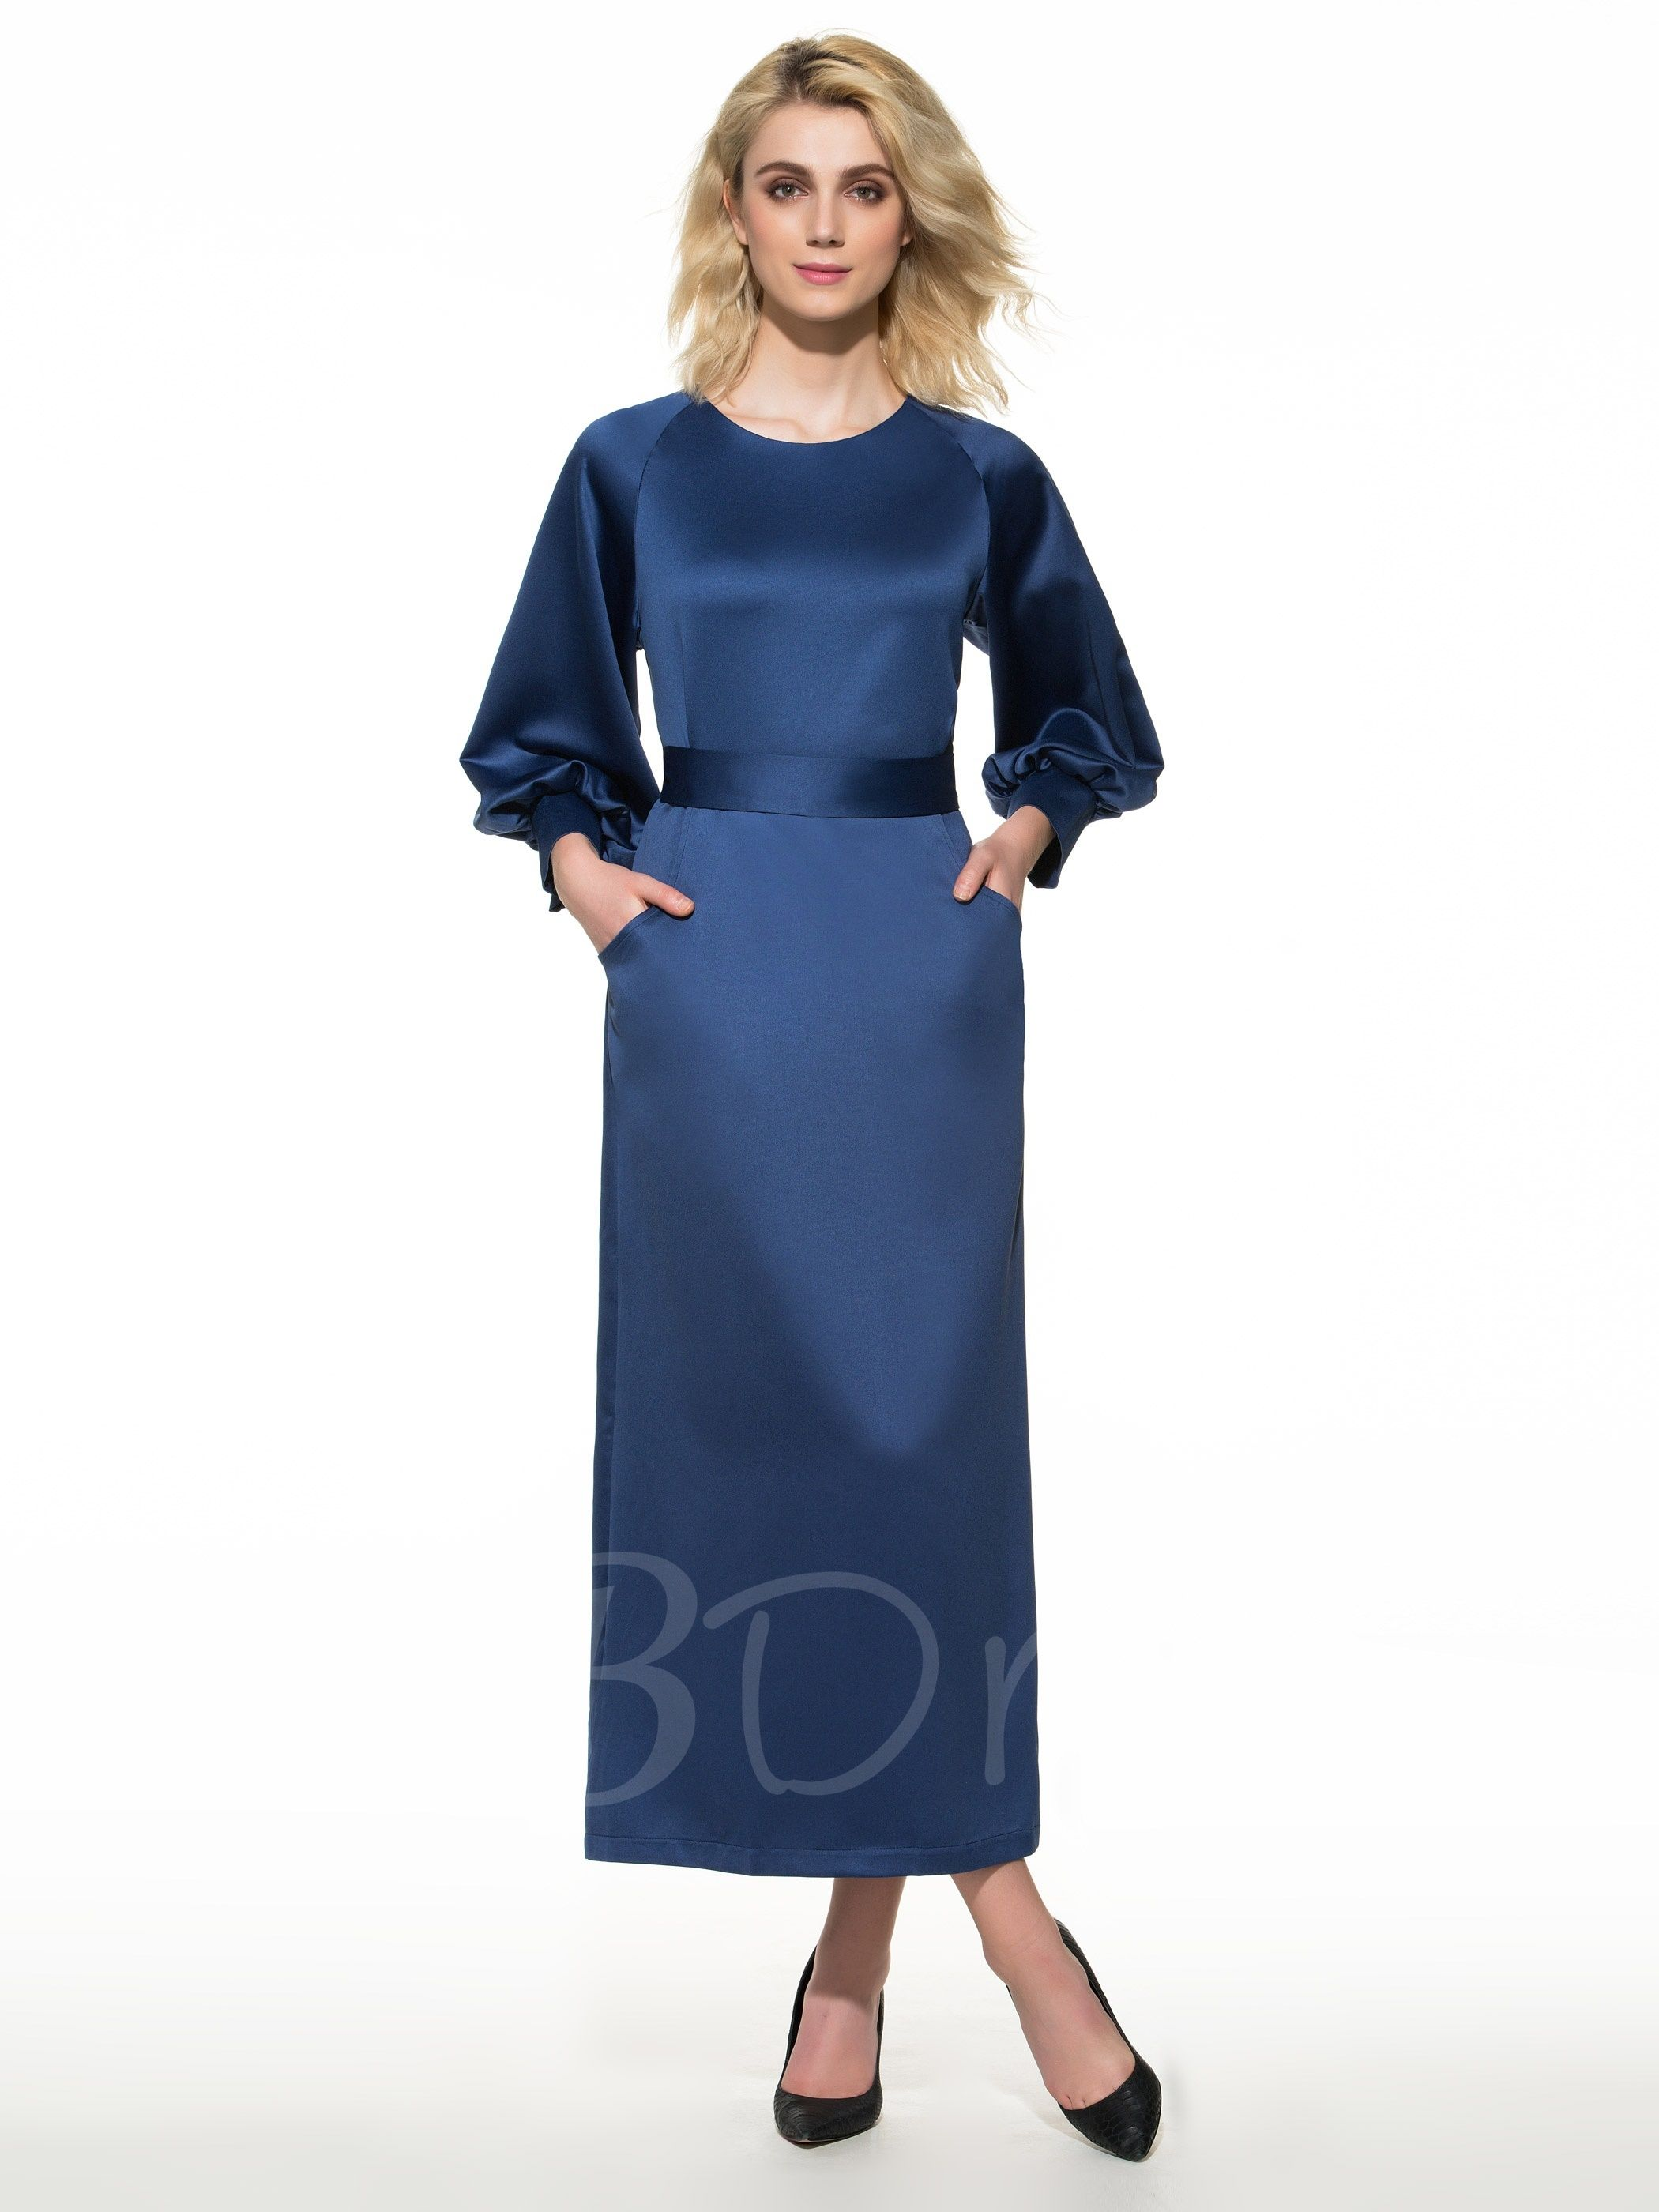 Plain Puff Sleeve Split Women S Maxi Dress Womens Maxi Dresses Dresses Maxi Dress [ 2800 x 2100 Pixel ]